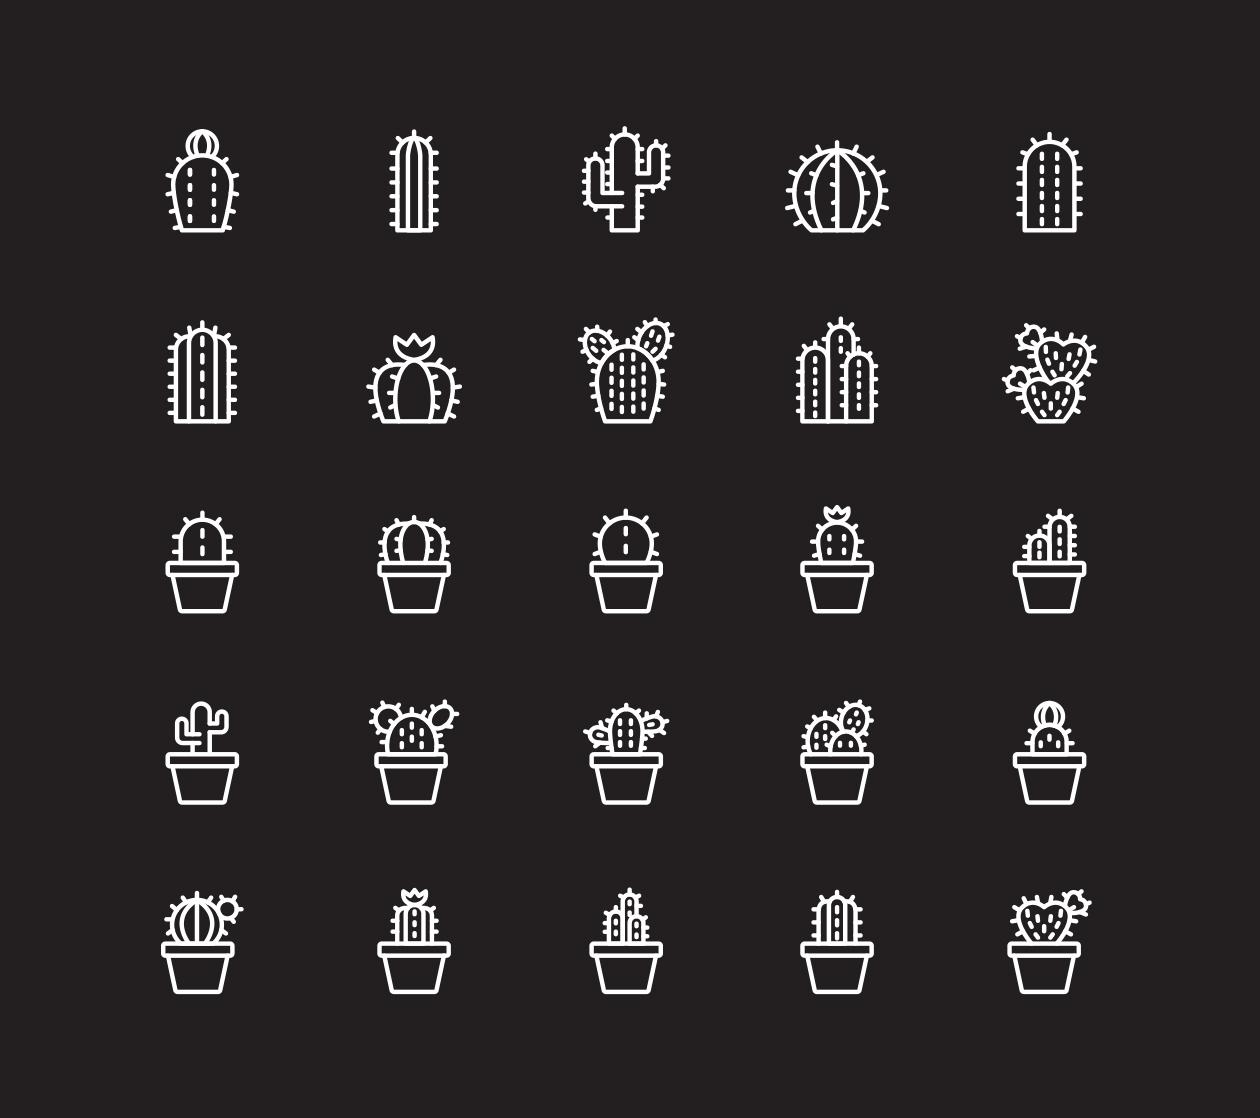 Cactus Plant Icons